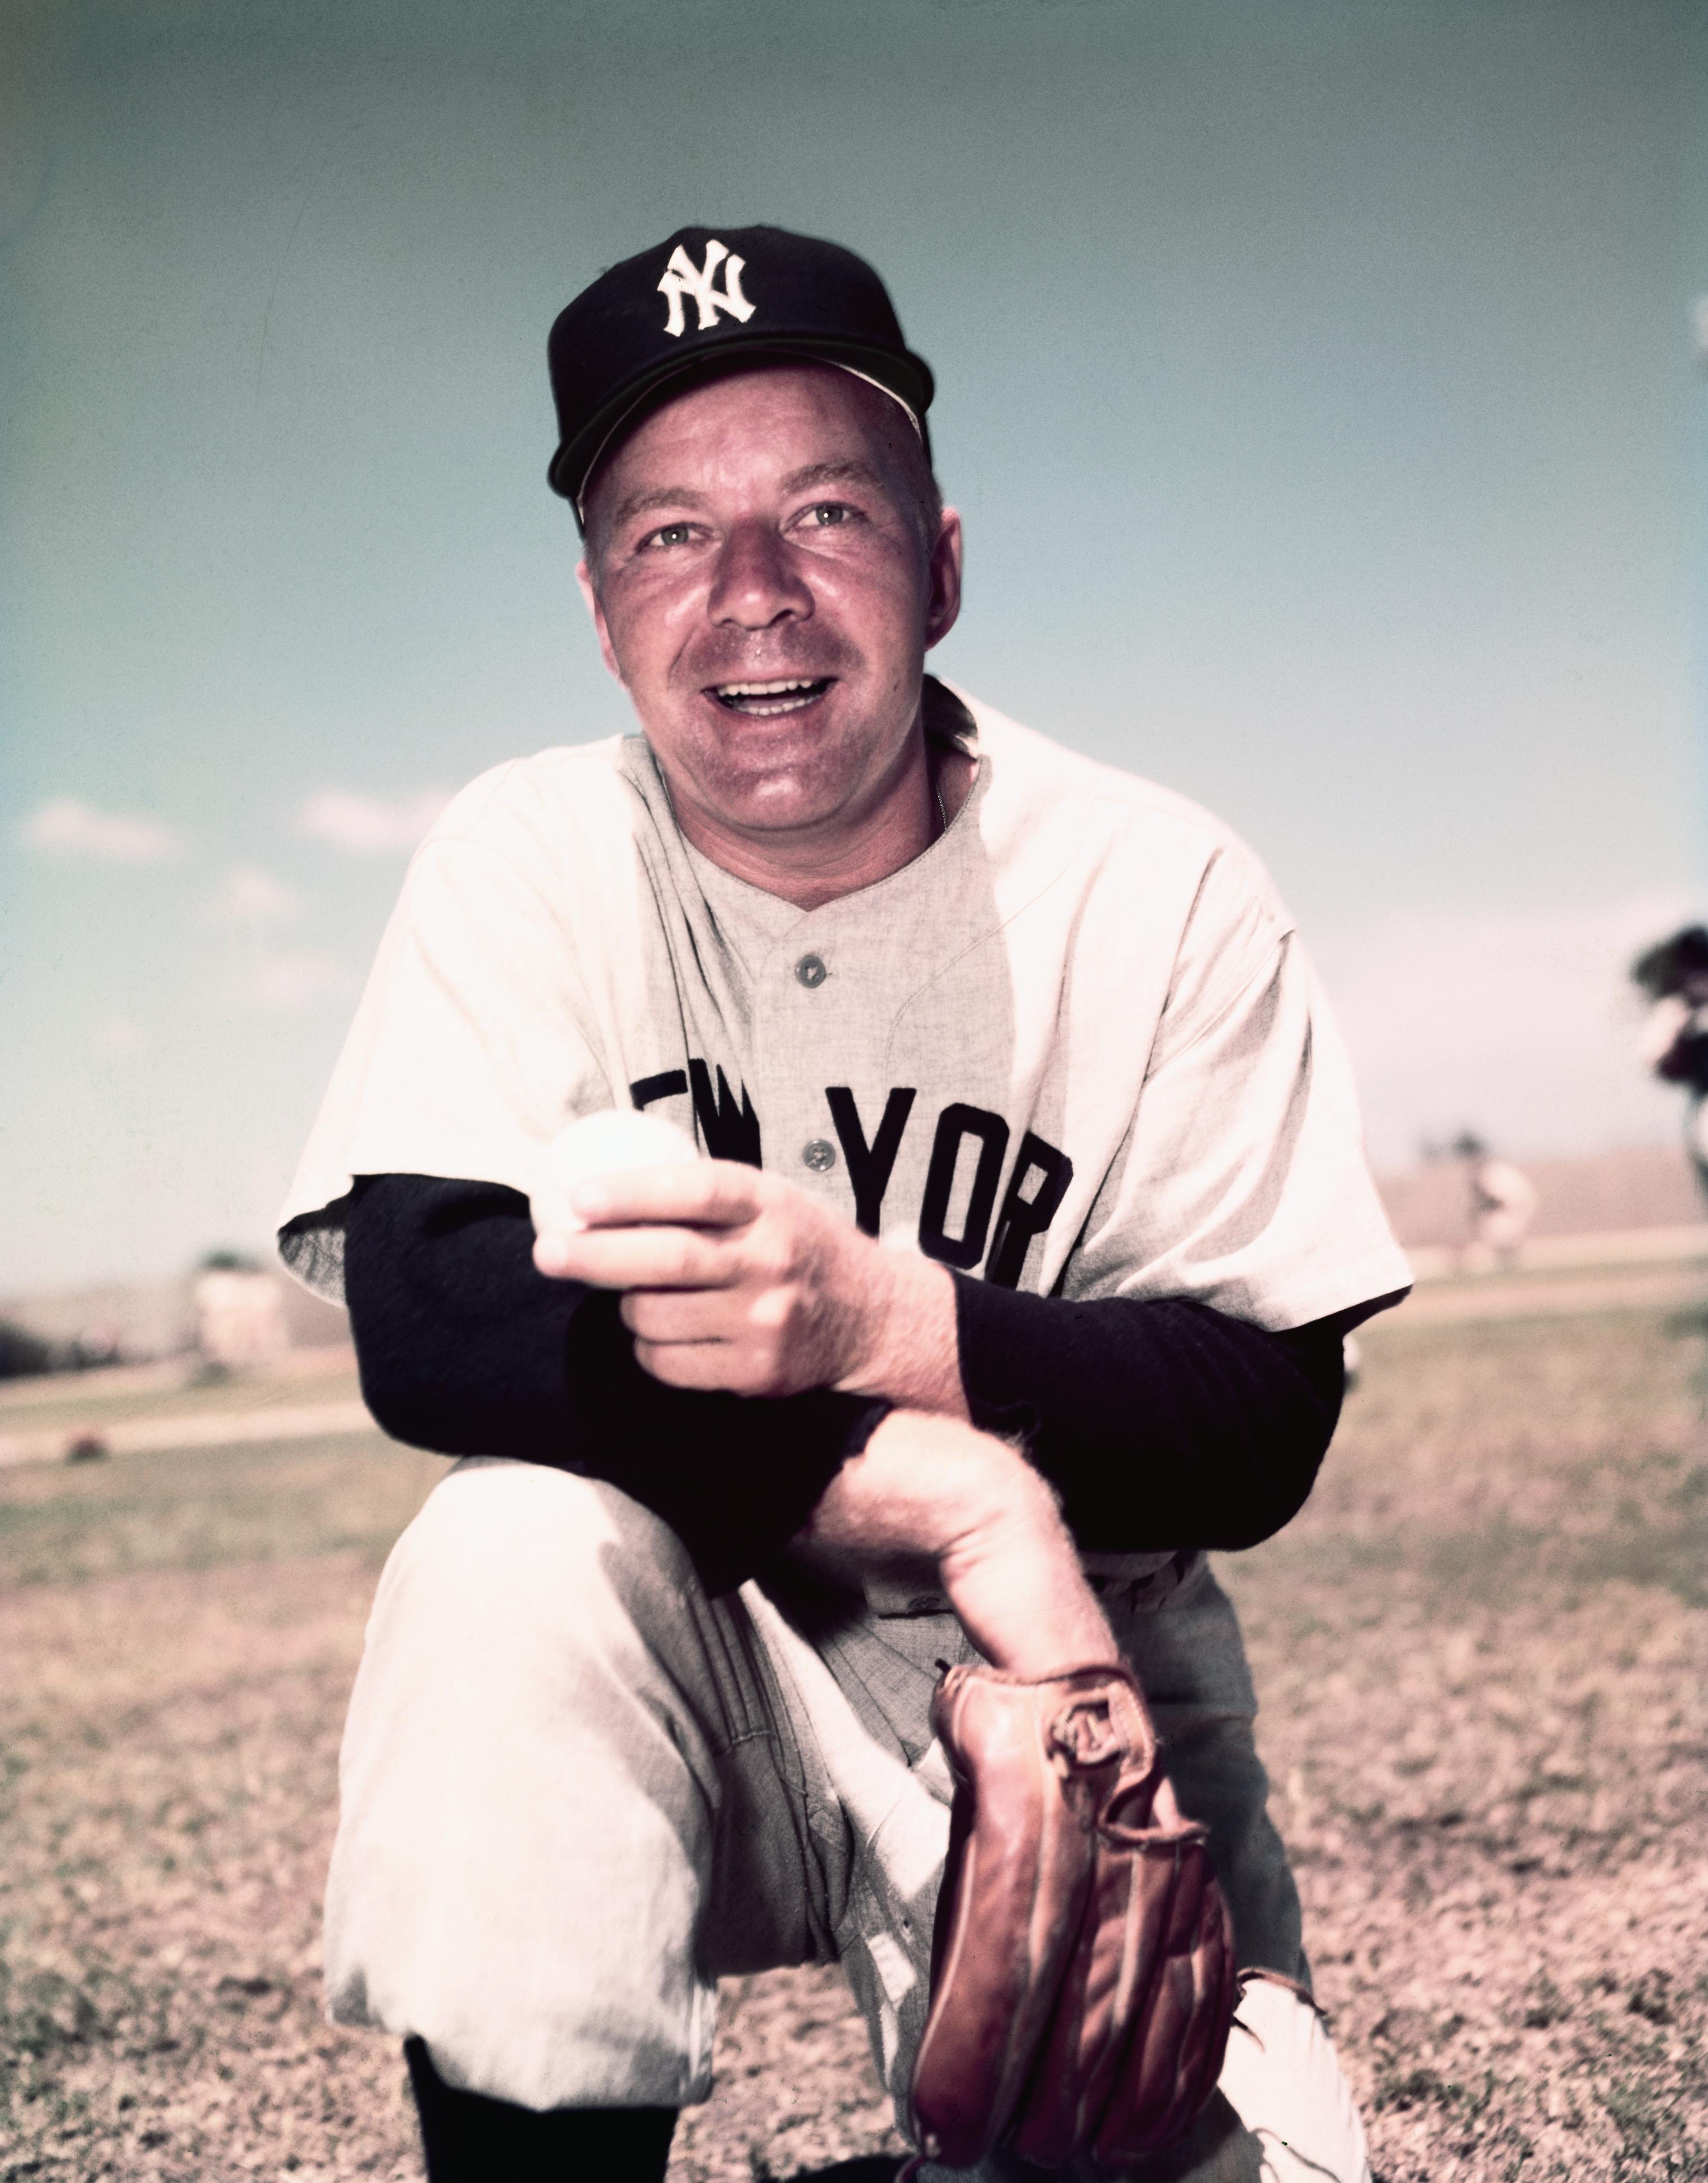 Portrait of Baseball Player Ed Lopat